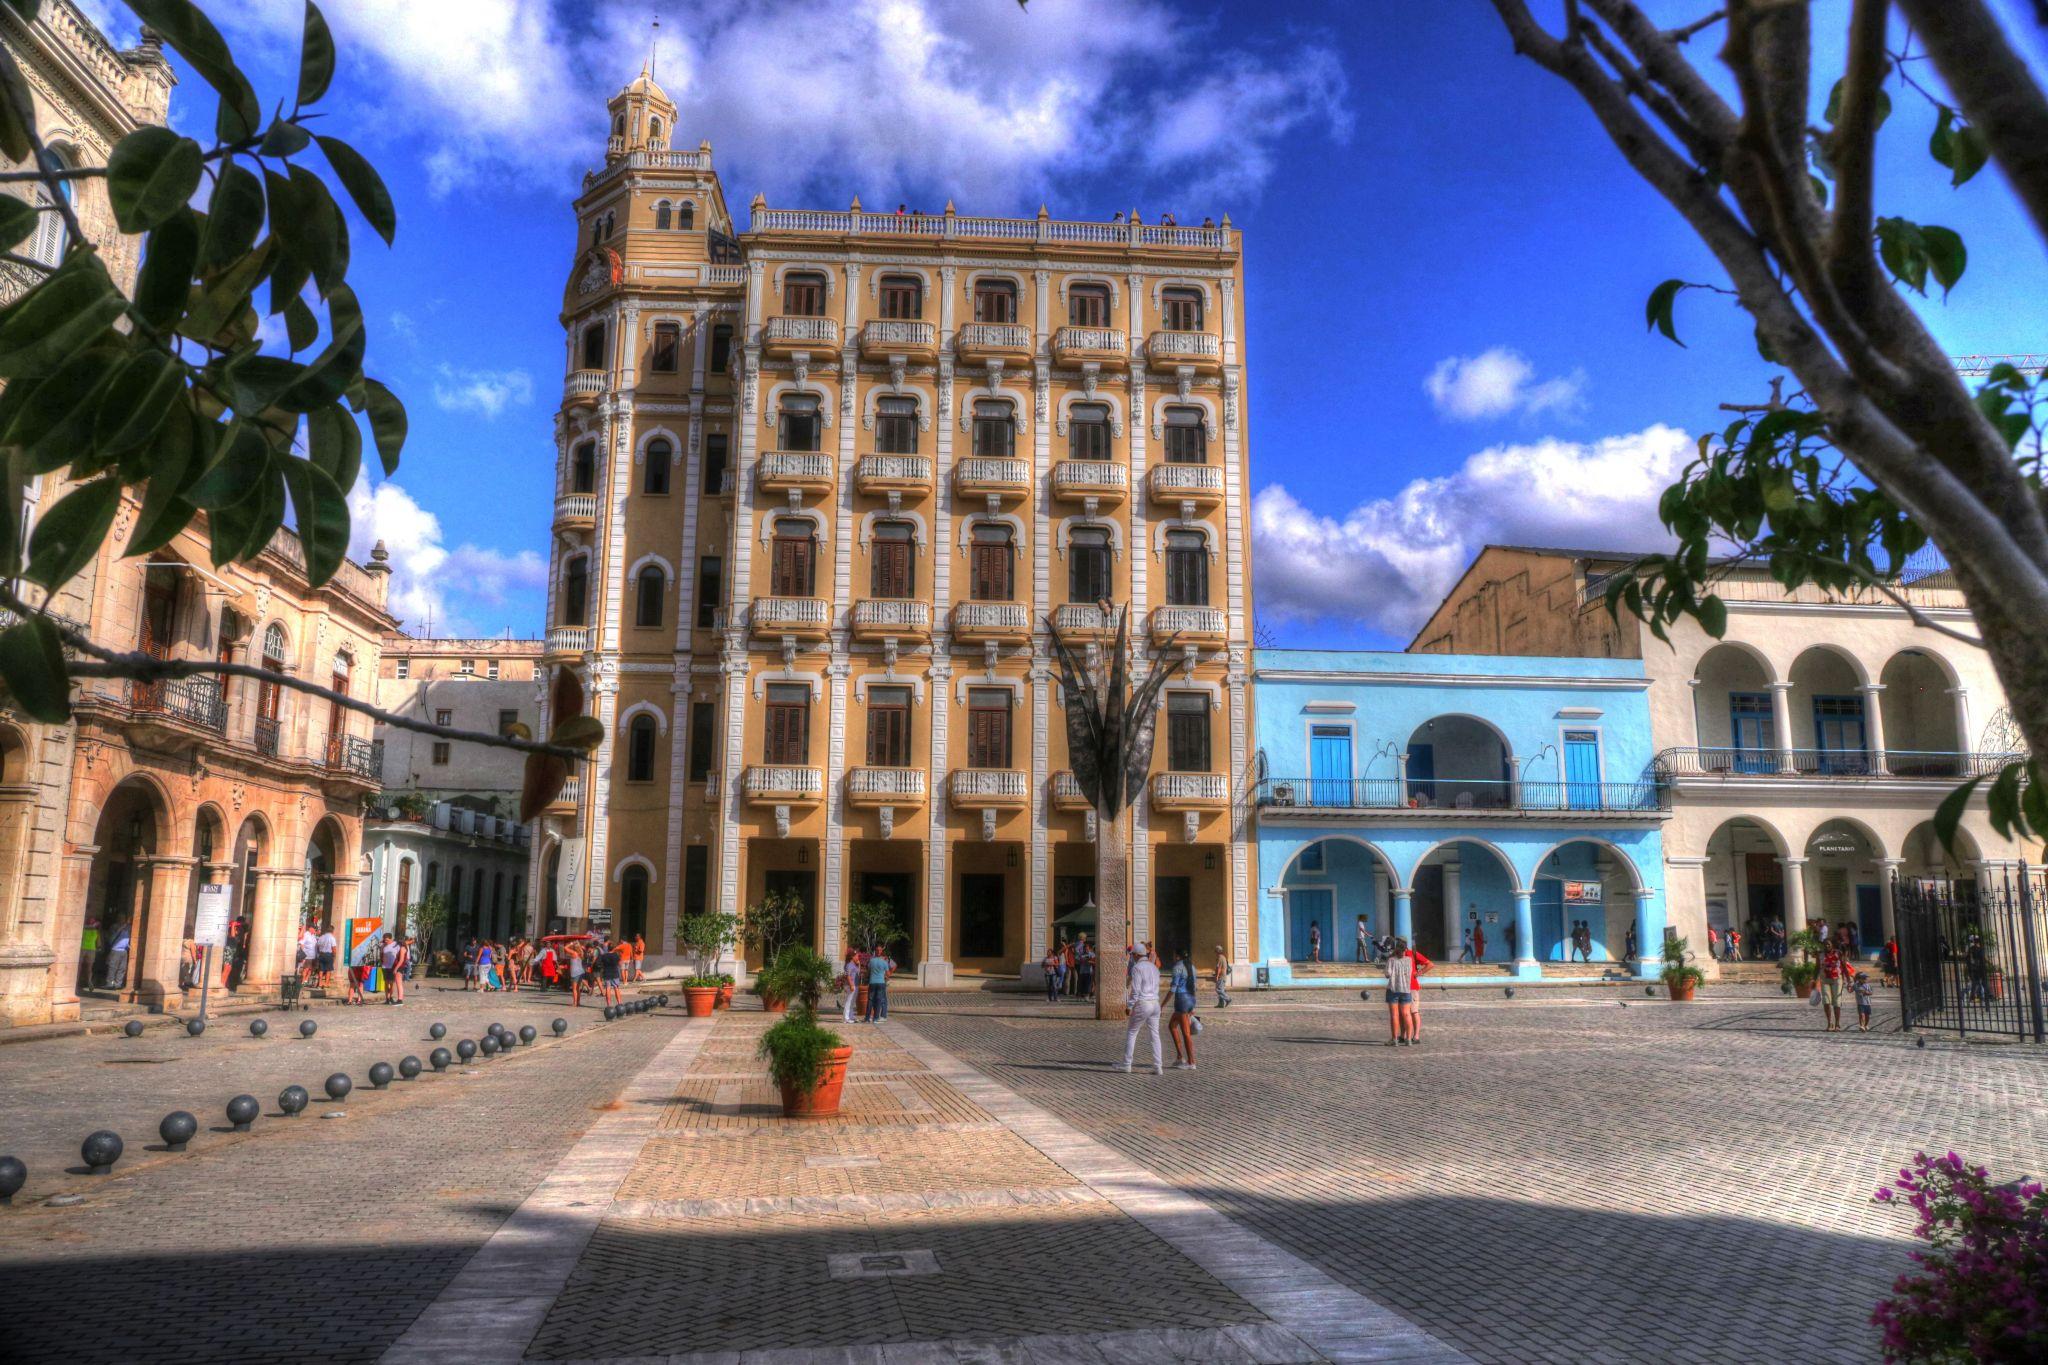 Plaza Vieja in Havana (Cuba), Cuba